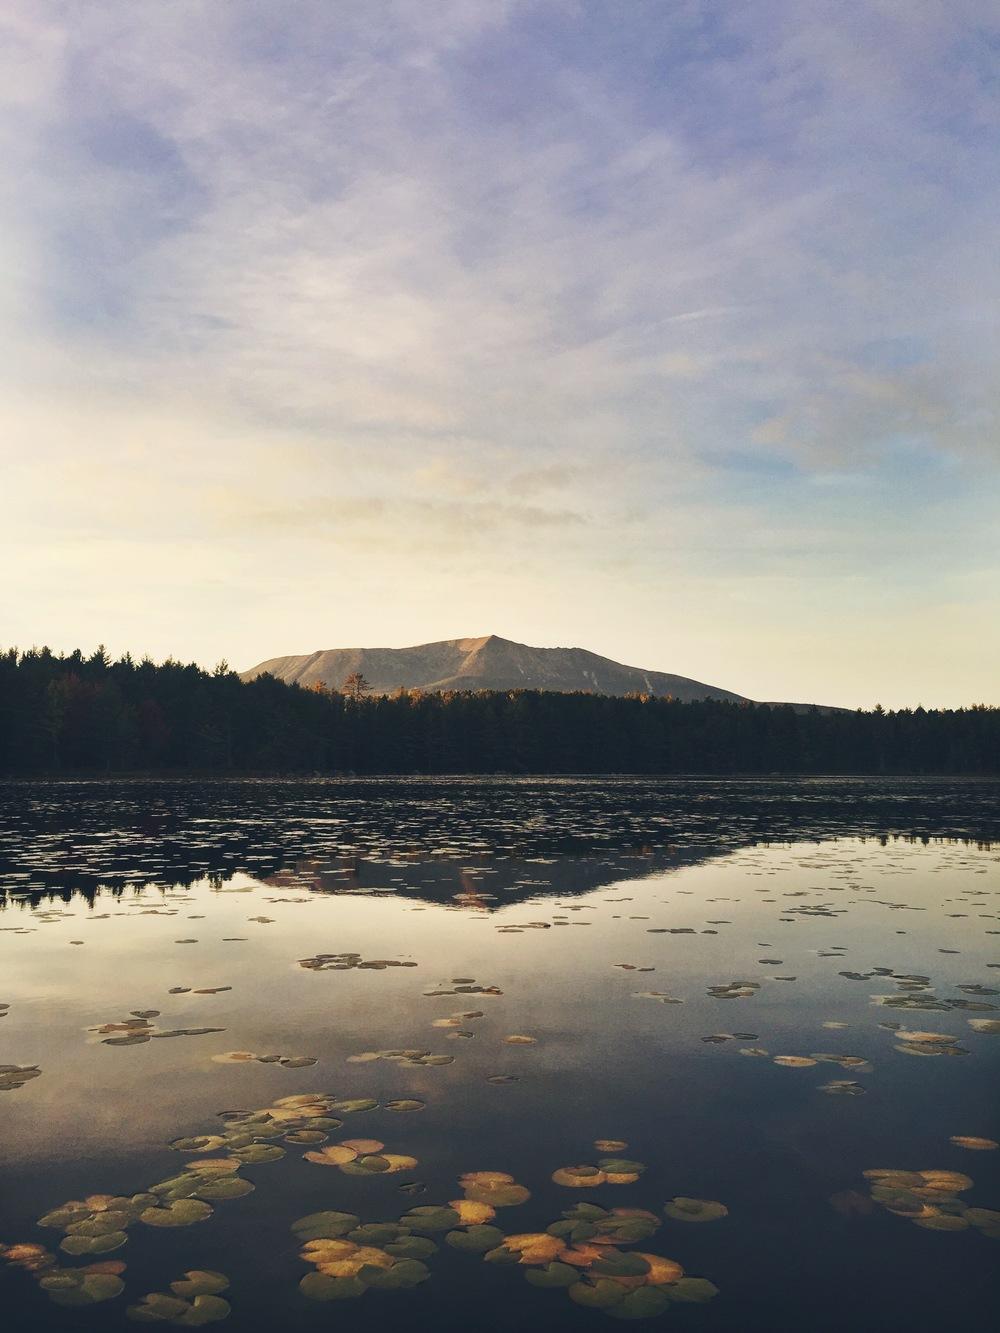 Evening view of Katahdin from Pockwockamus Pond